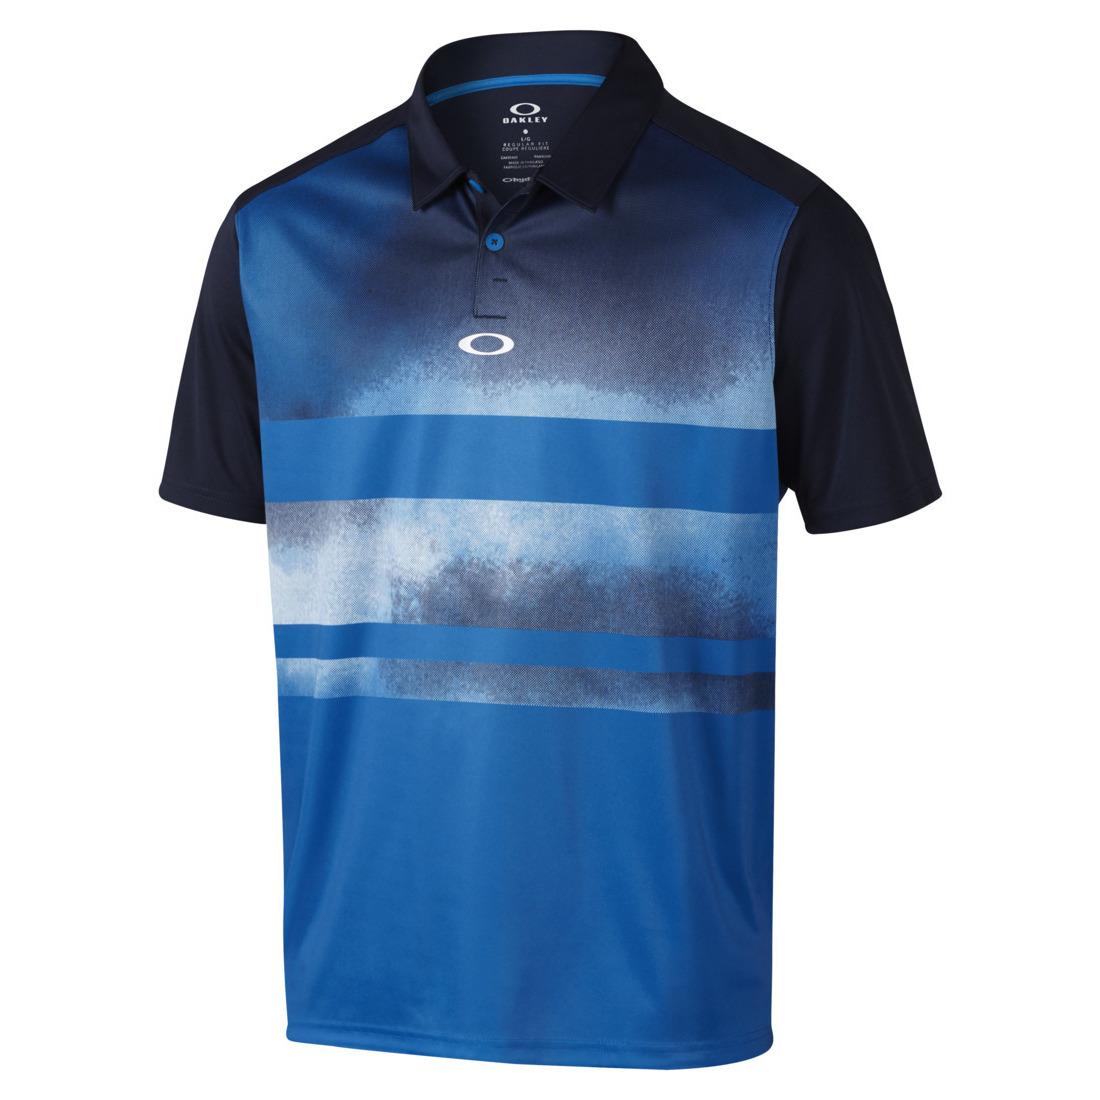 Blue and Black Gradient Striped Oakley Polo